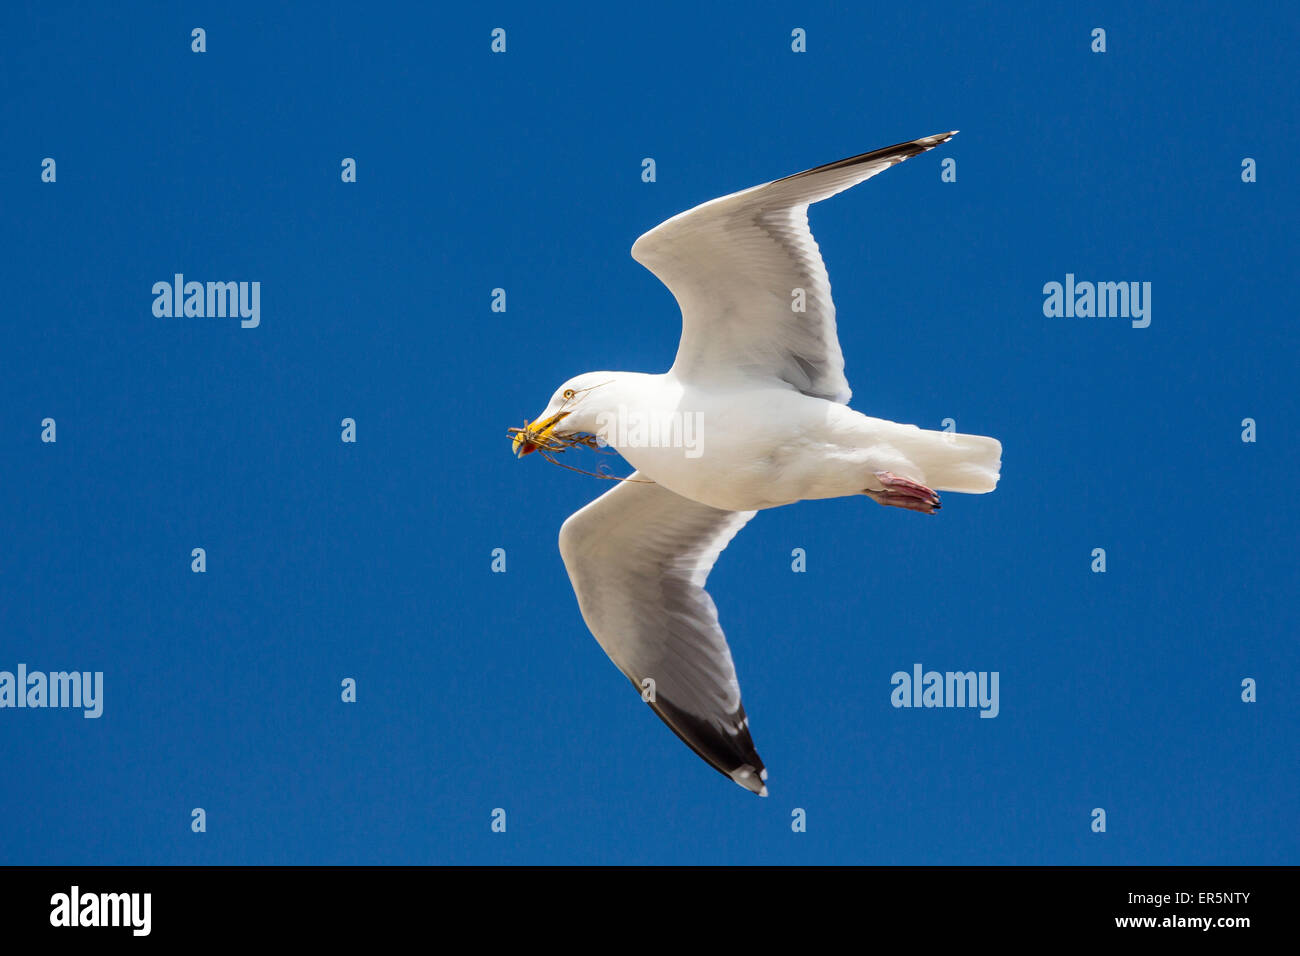 Herring gull in flight carrying nesting material, Larus argentatus, North Sea, Germany, Europe - Stock Image